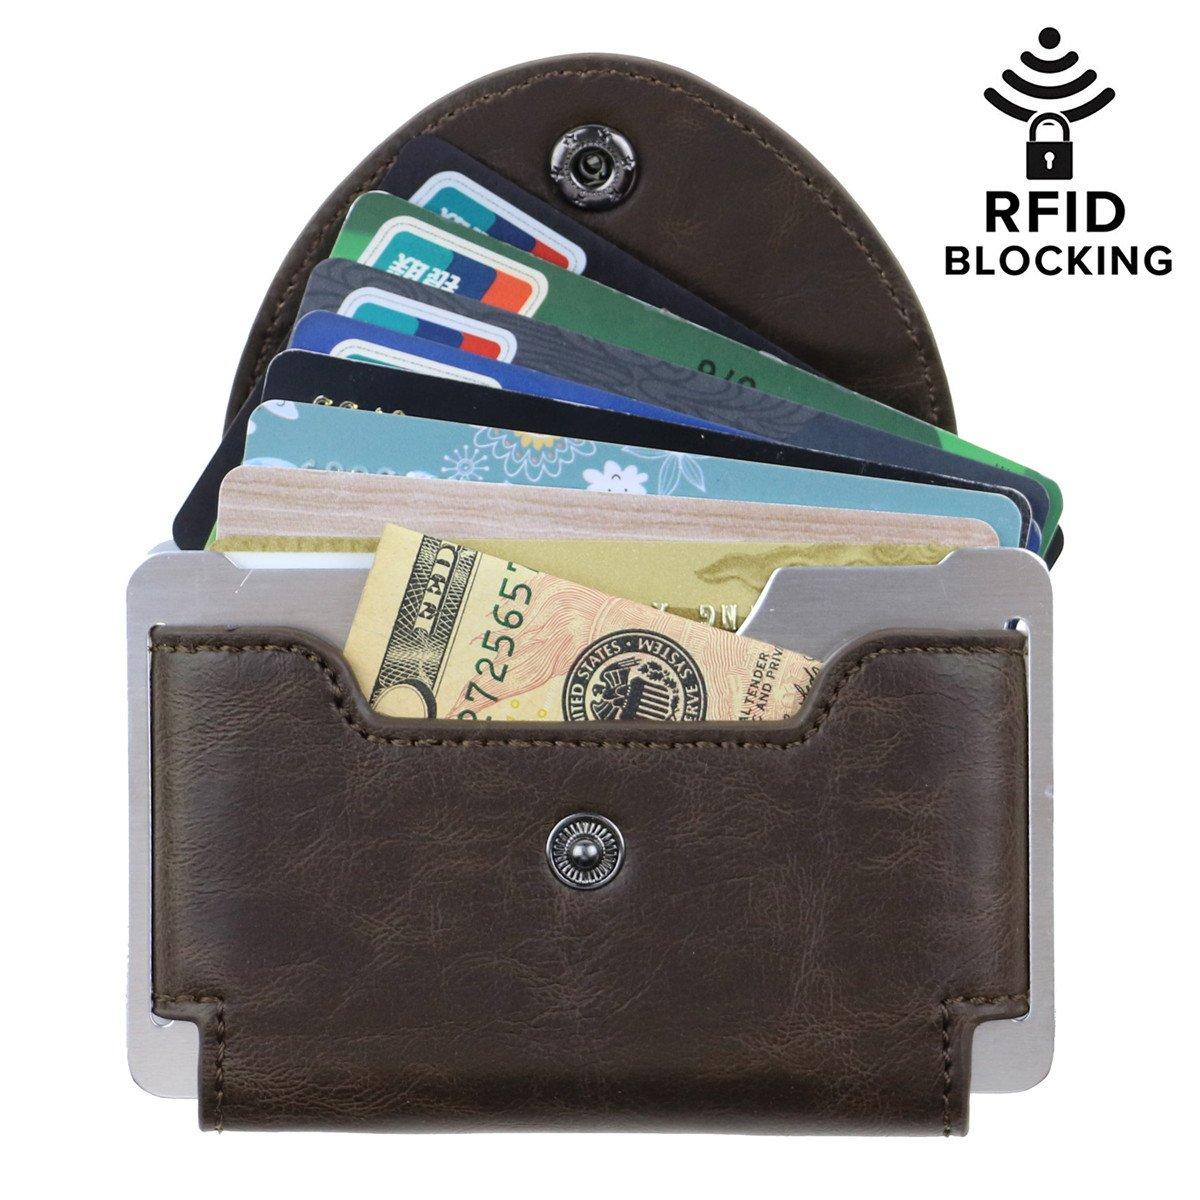 Cimostar Minimalist Wallet RFID BLOCKING Credit Card Holder Slim Pocket Credit Card Wallet For Men and Women (Brown)